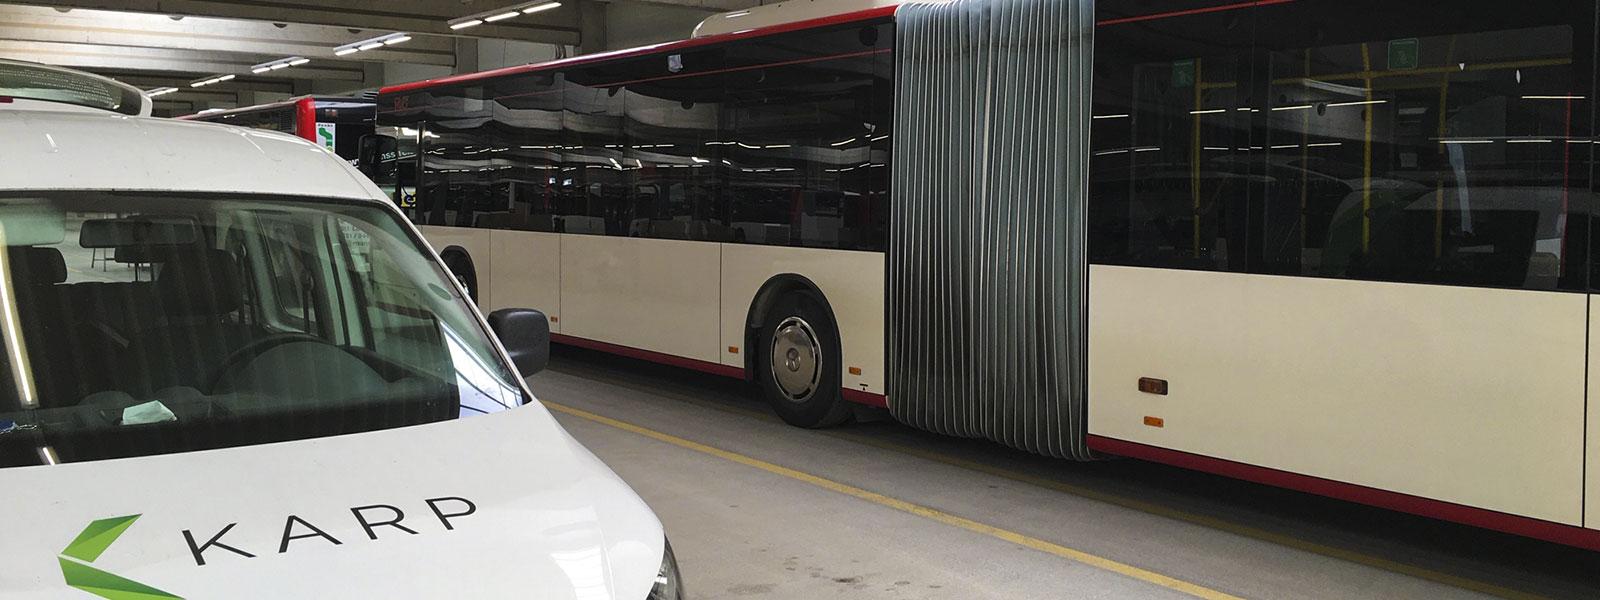 Karp GmbH Fahrzeugeinbauten ITCS Tetra BG-Fis/ Ifis/ Dfi WLAN Ortungssysteme